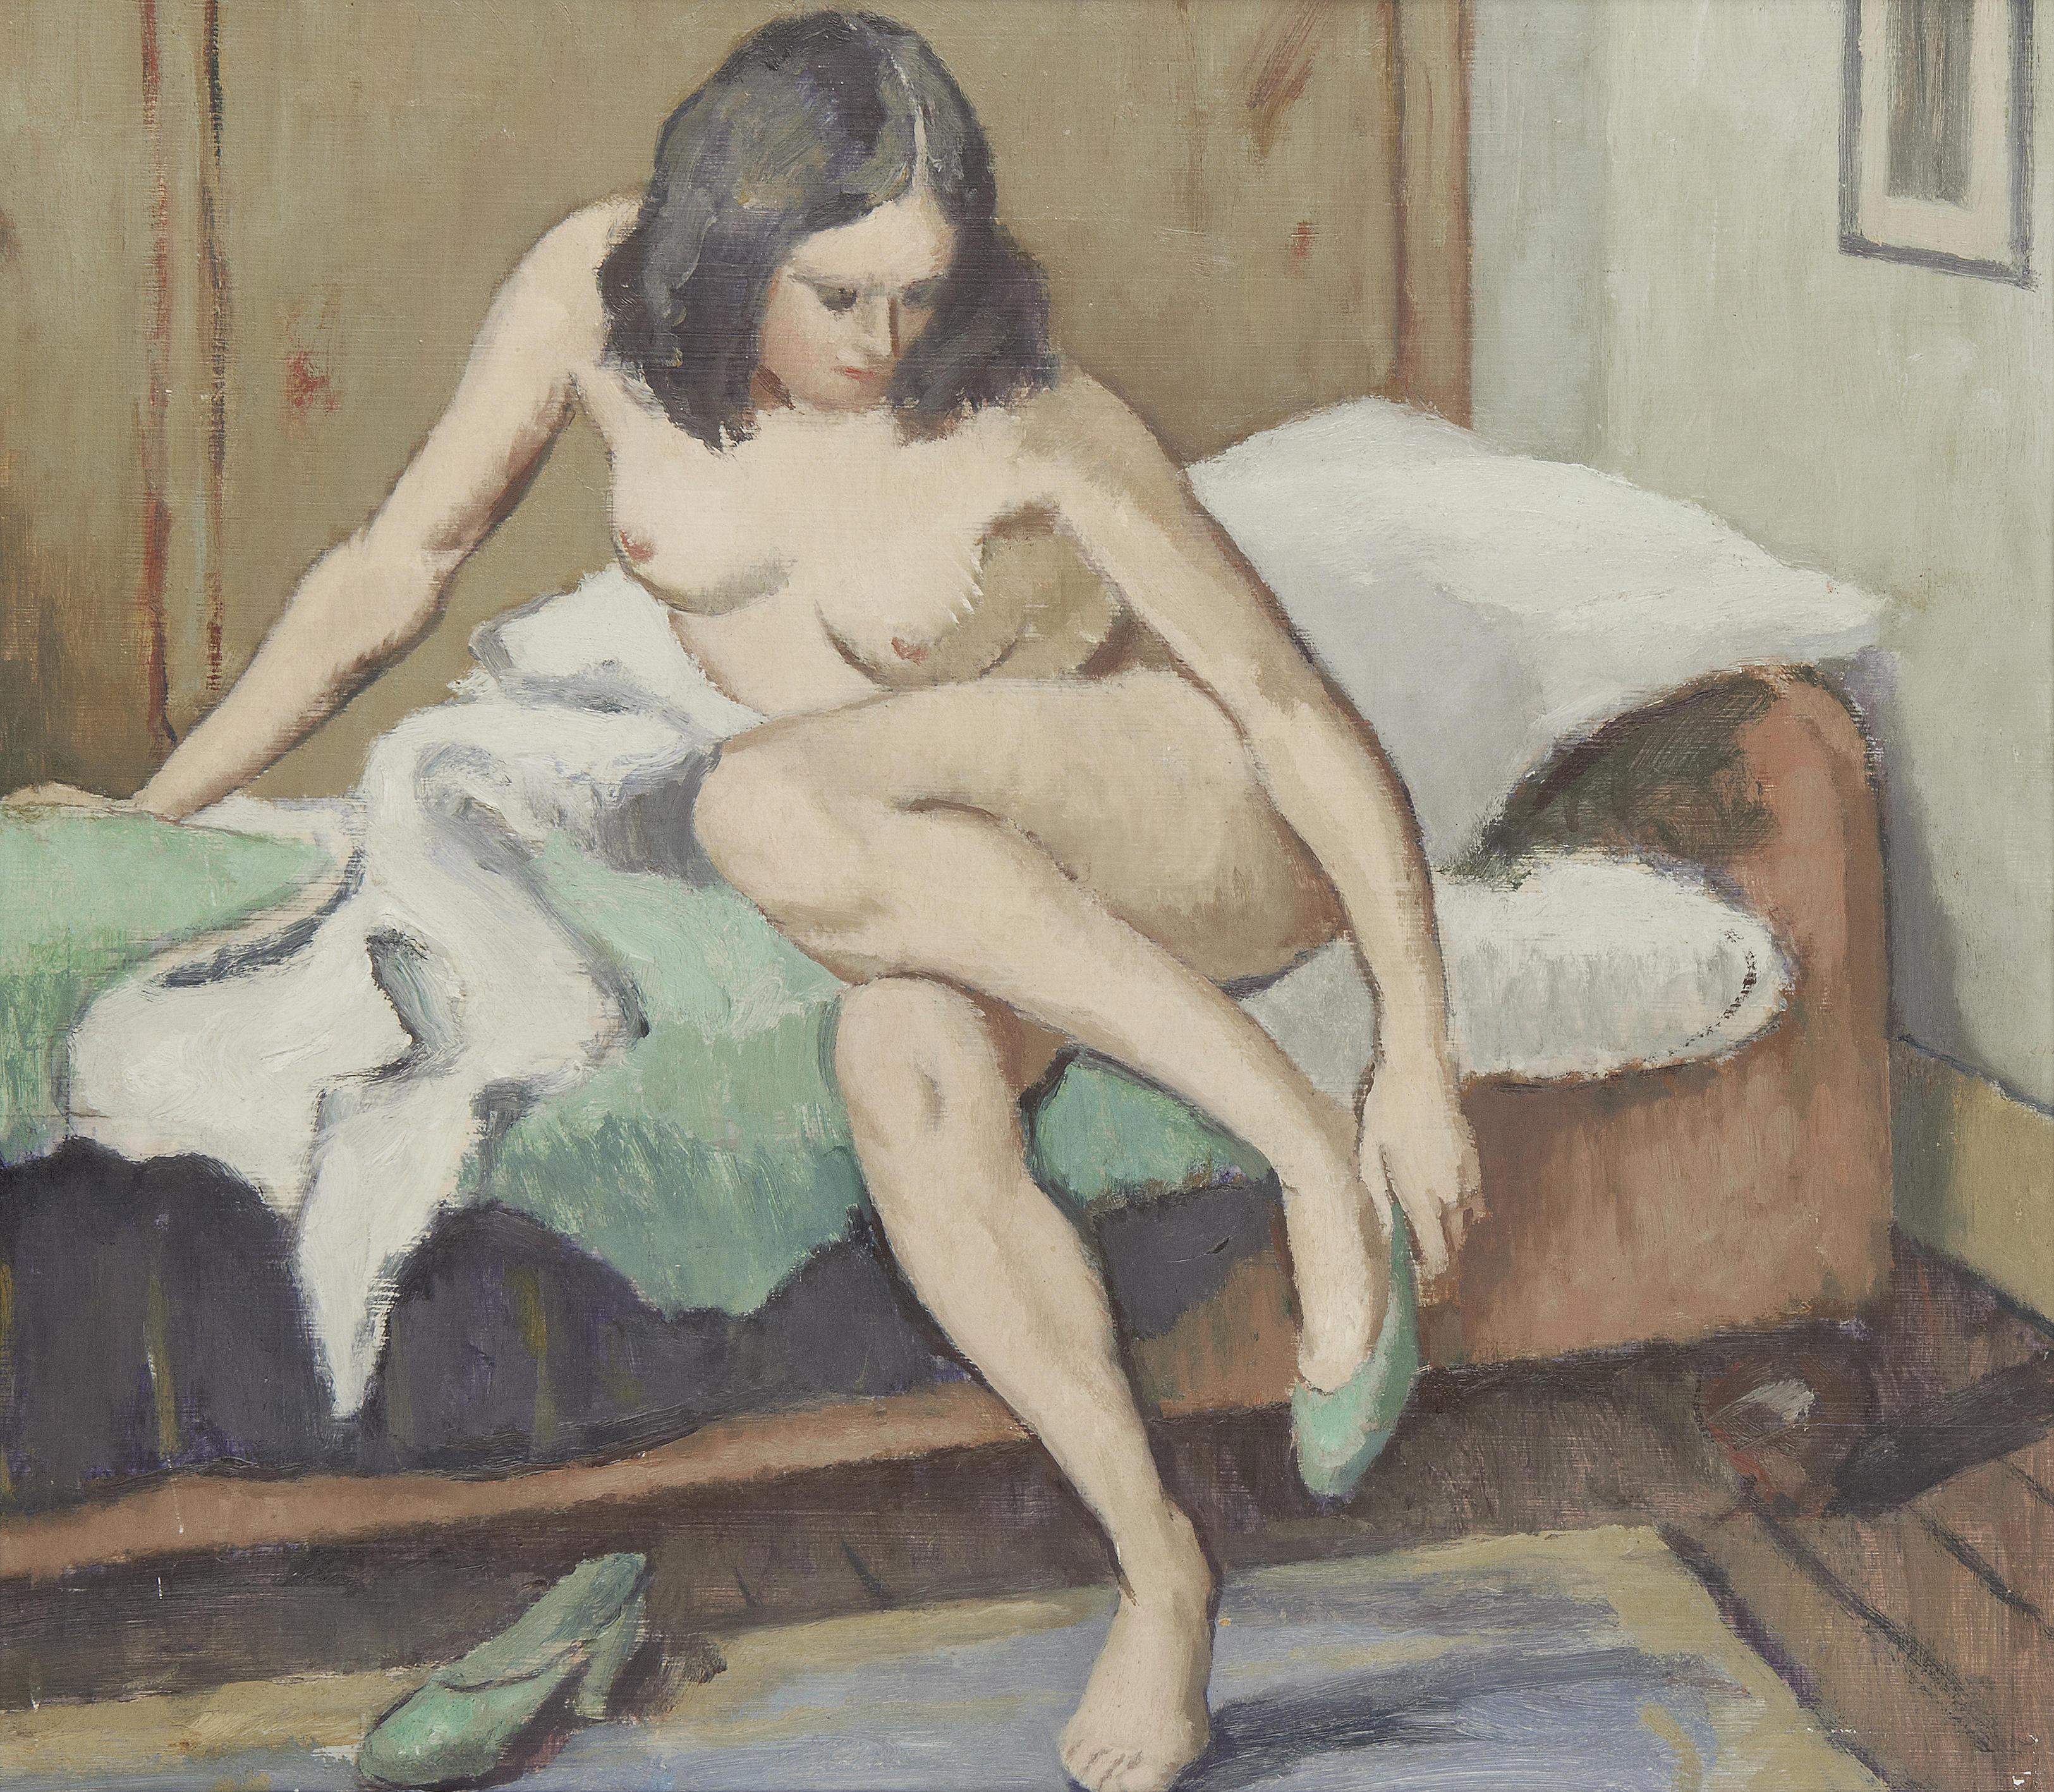 Clifford Hall, 1904-1973. Сидящая обнаженная с зелеными туфлями. 37.5 x 42.5 см. Частная коллекция